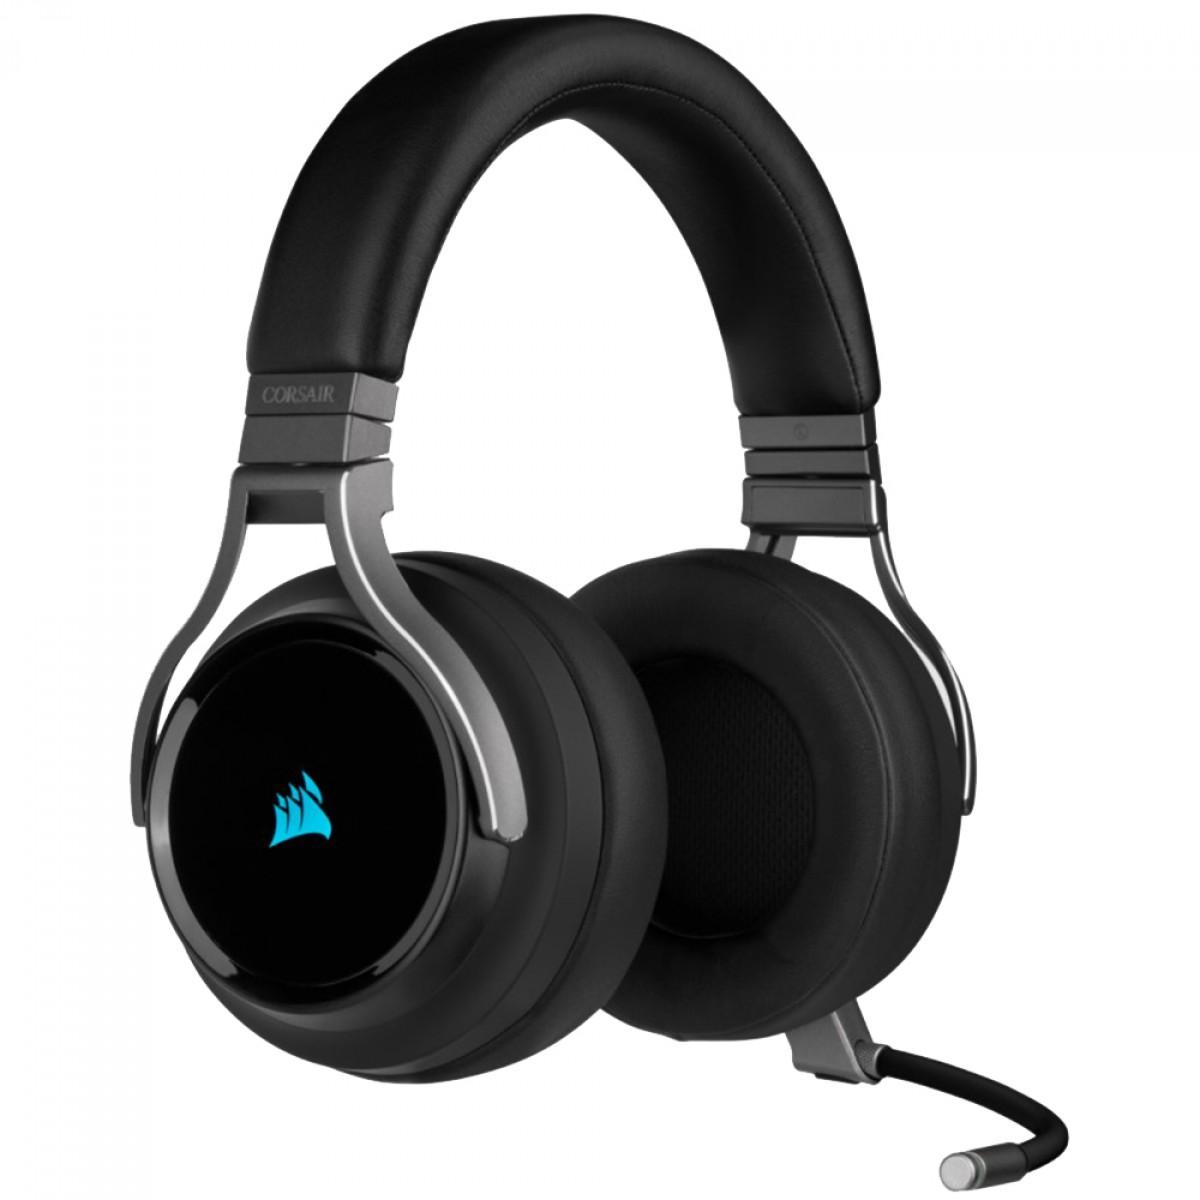 Headset Gamer Corsair Virtuoso Carbono, Sem fio, USB, 3.5mm, PC, PlayStation 4/5, Dispositivos Móveis, RGB, CA-9011185-NA